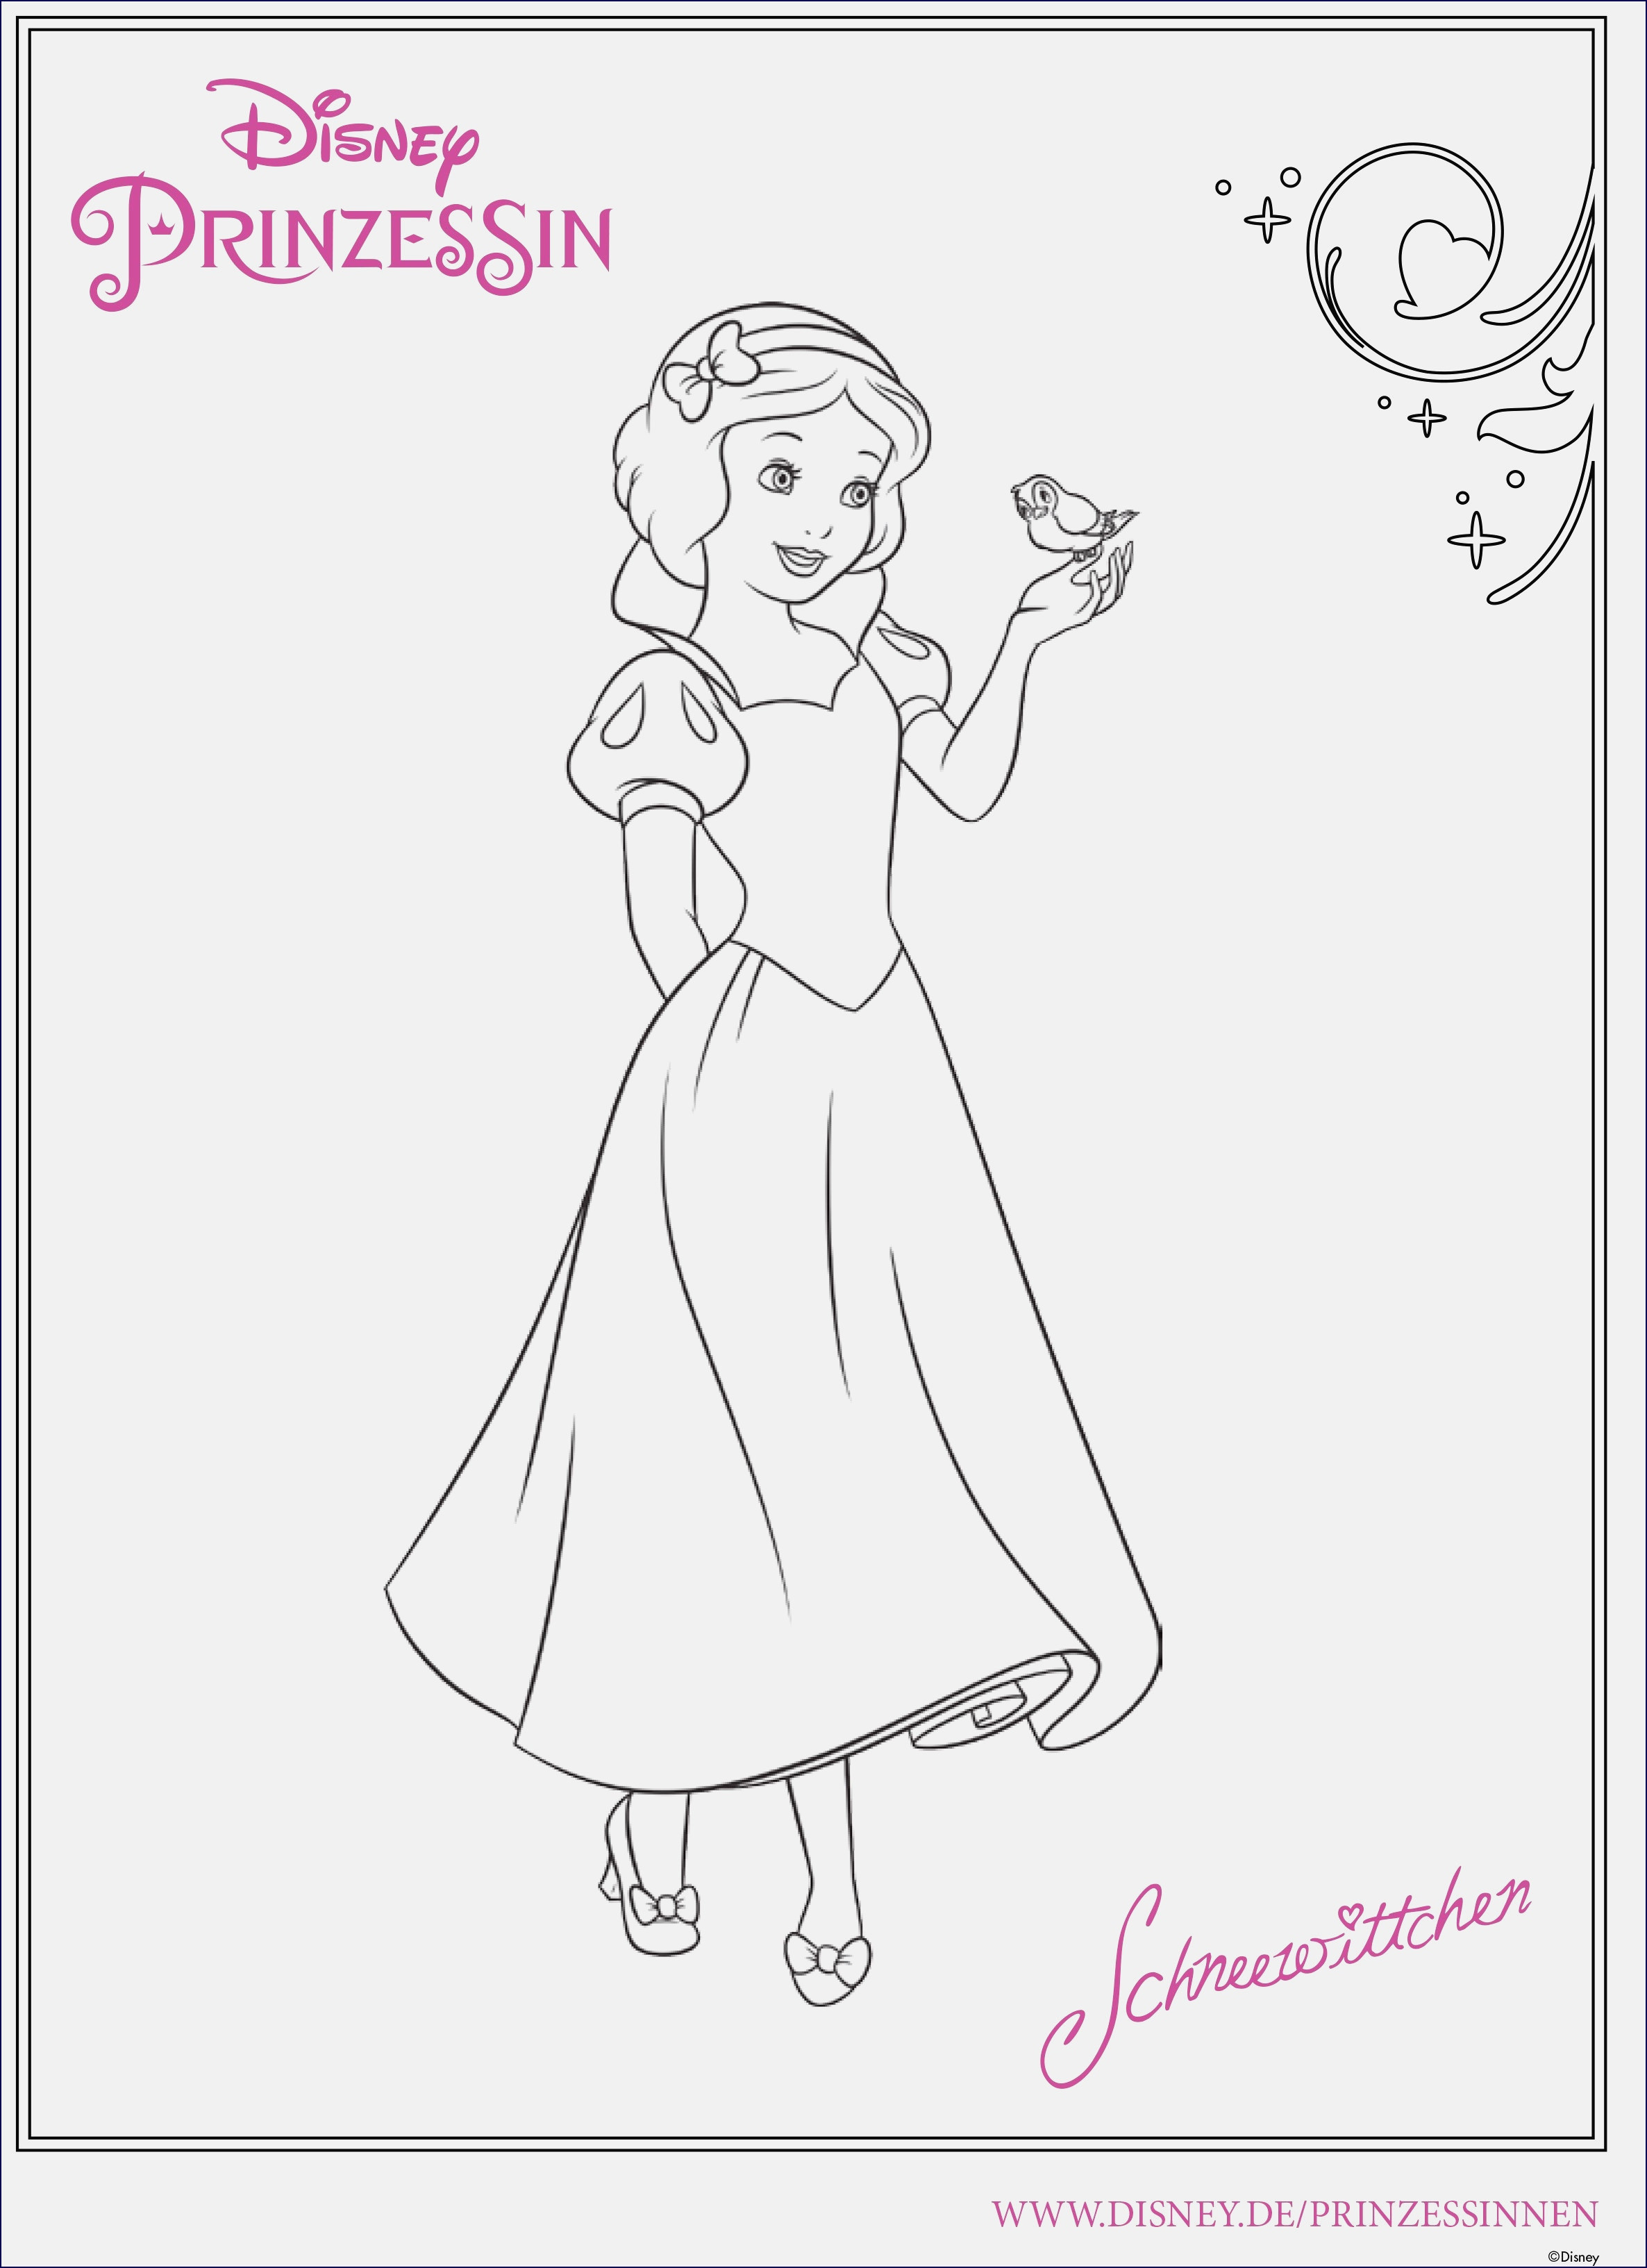 Prinzessin sofia Ausmalbilder Einzigartig 37 Disney Ausmalbilder Zum Ausdrucken Scoredatscore Neu Ausmalbilder Bild